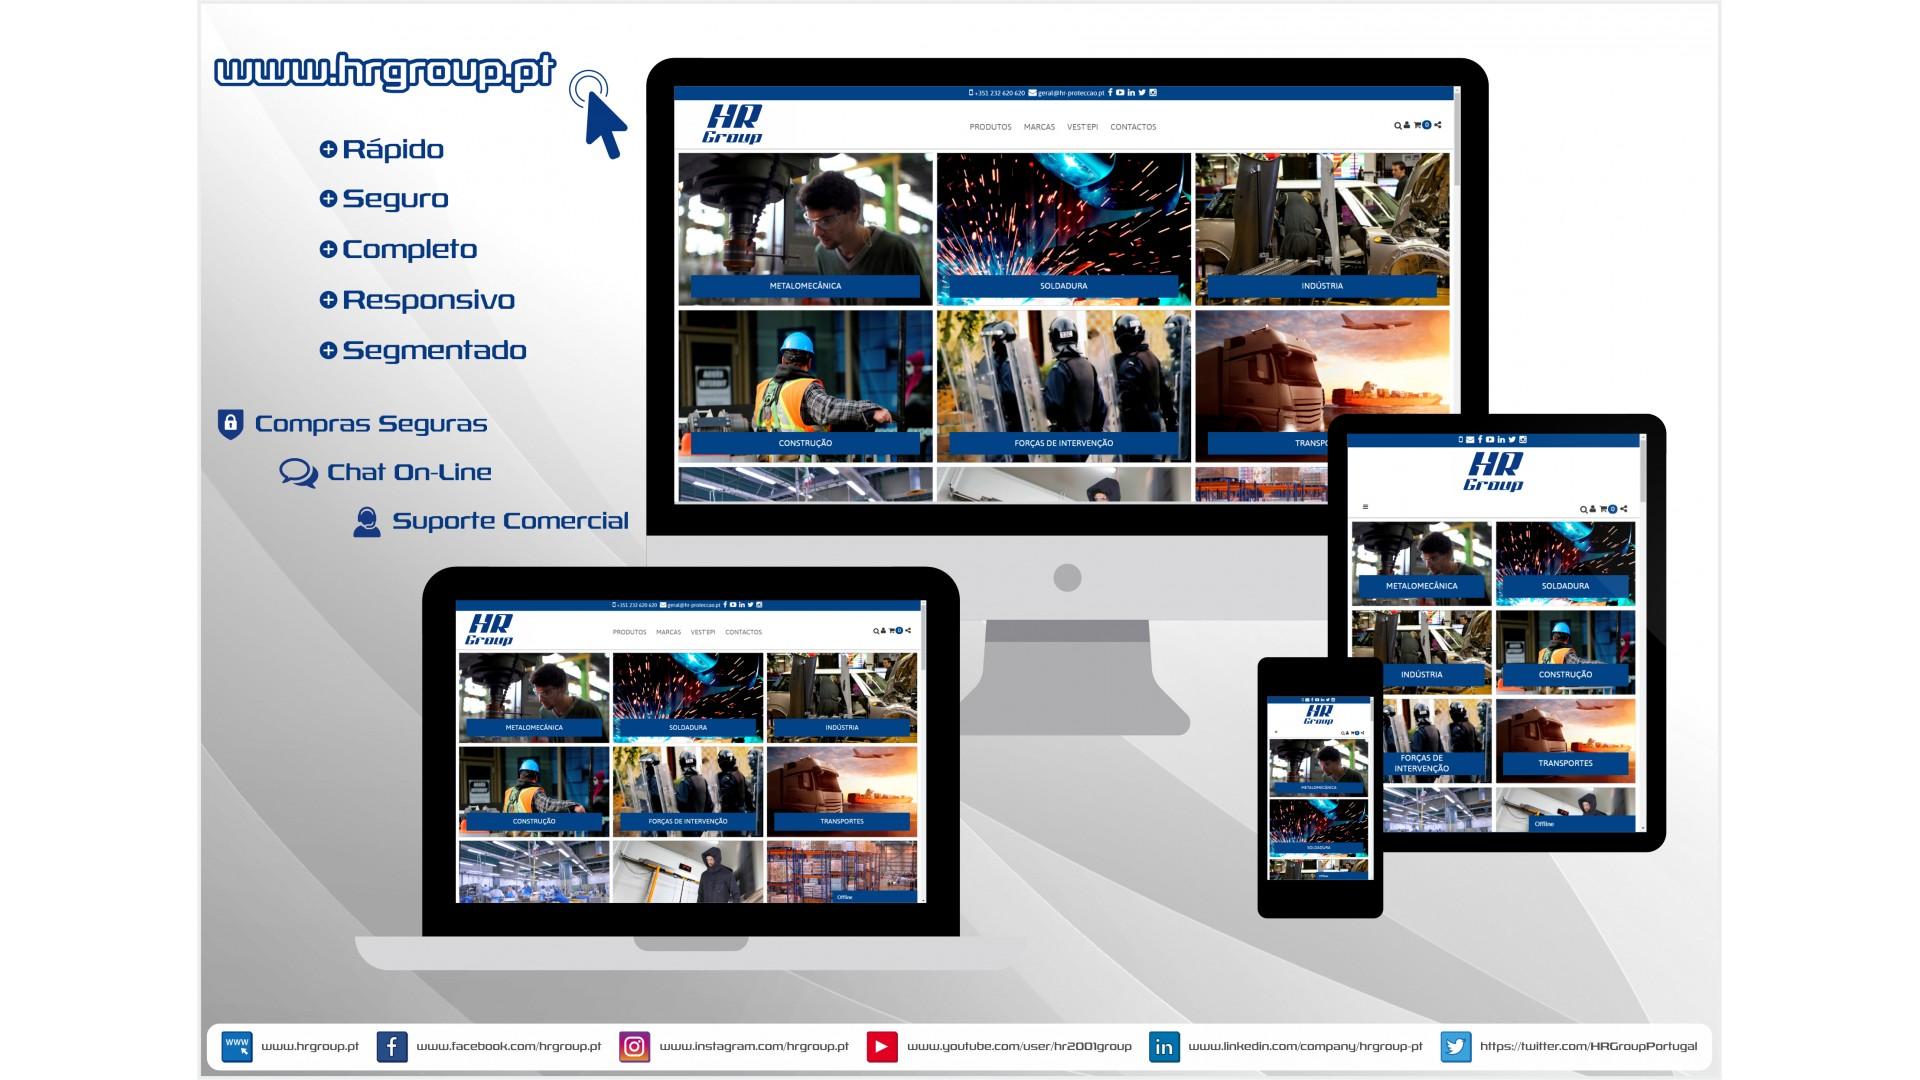 Novo Site HR Group